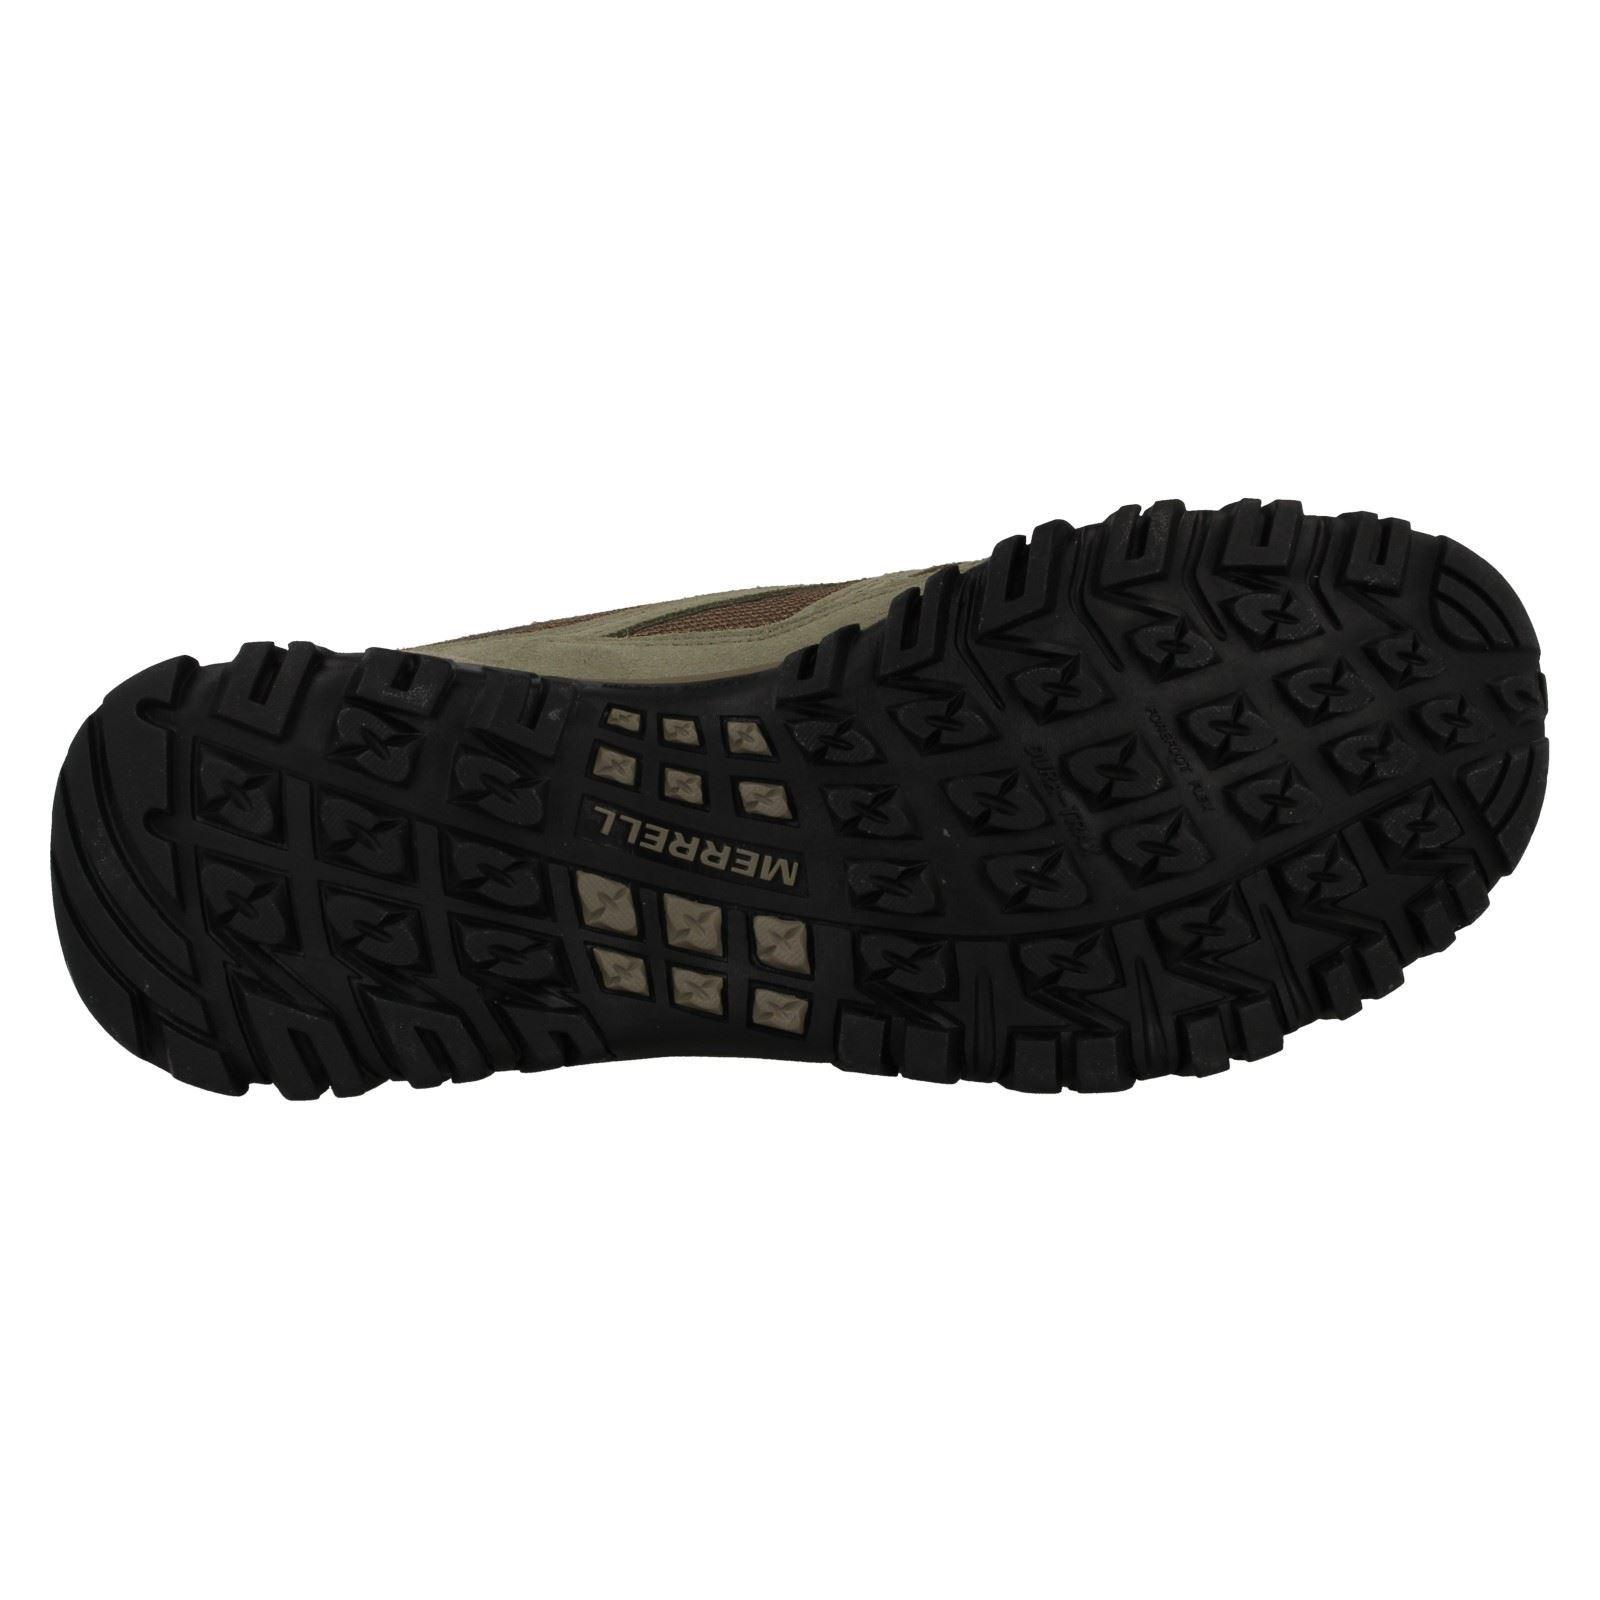 Mens Merrell Bluff Phoenix Bluff Merrell Casual Walking Shoes 0c1867